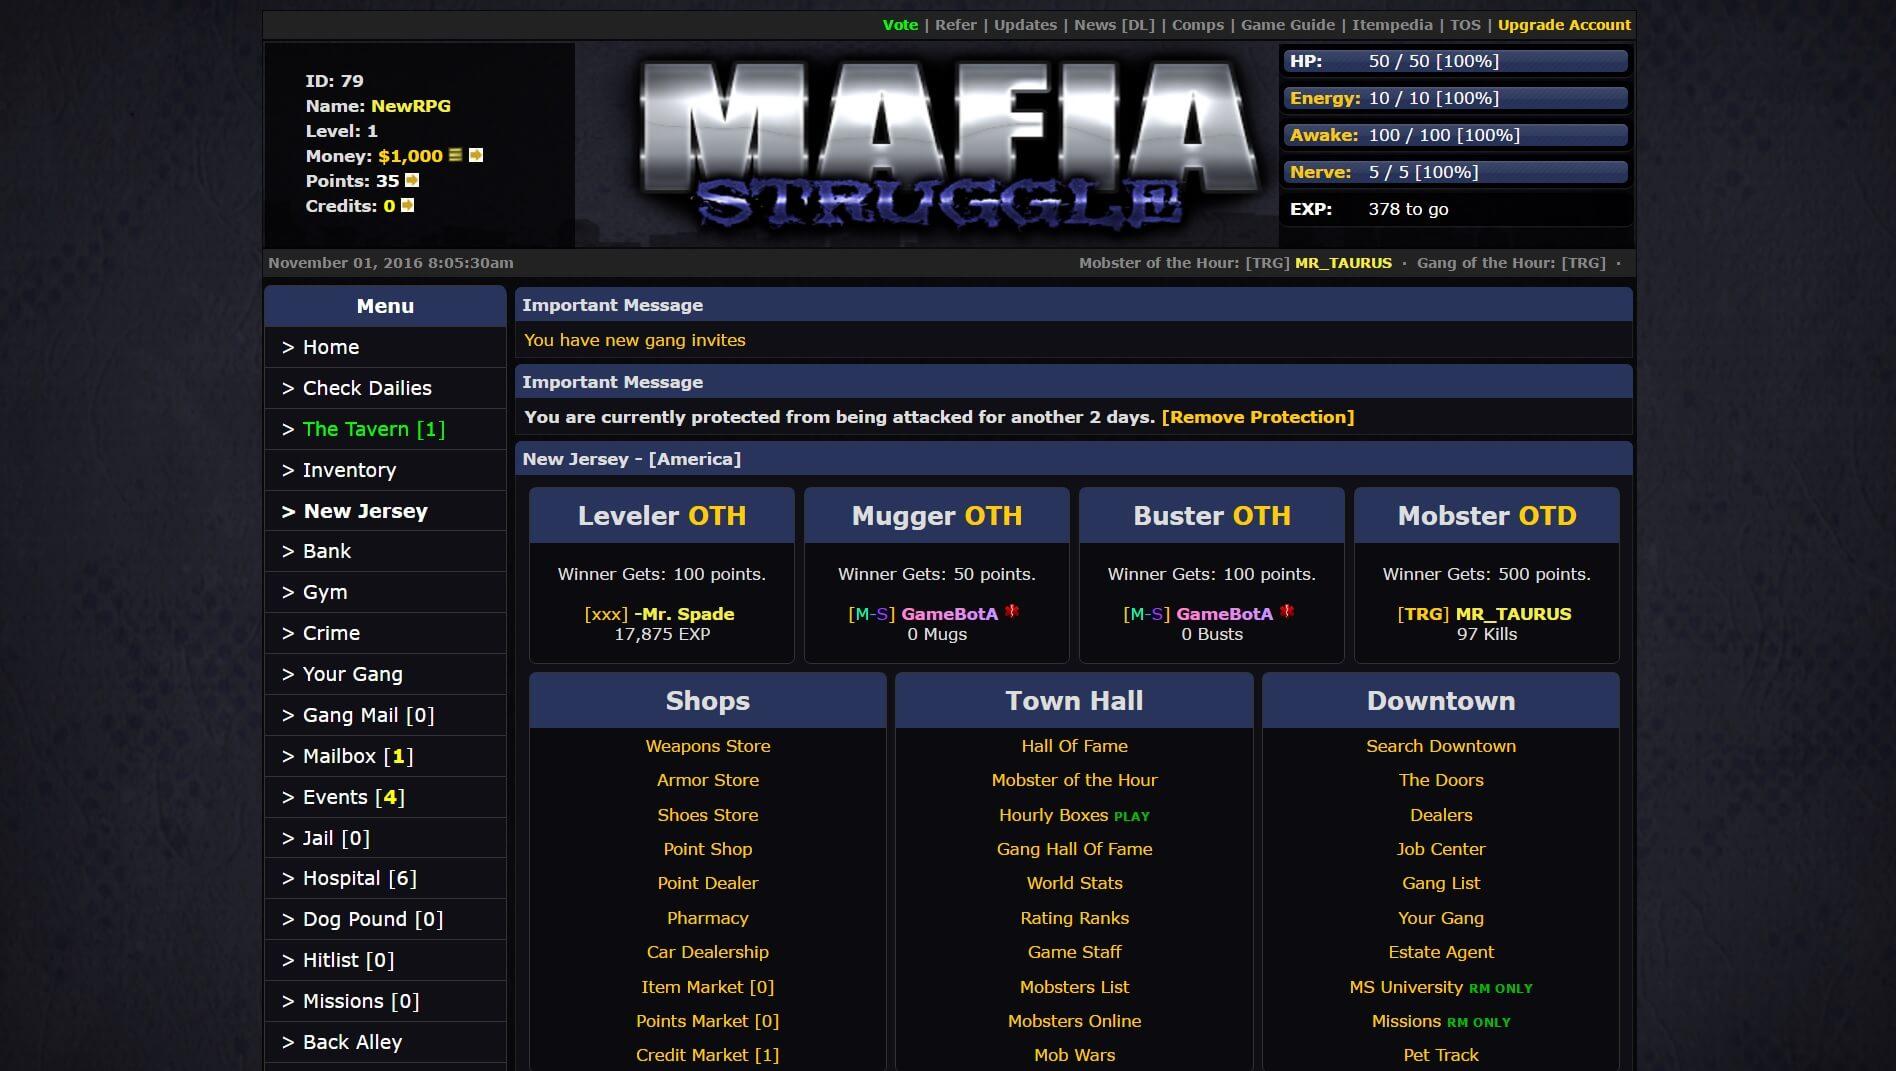 Mafia Struggle